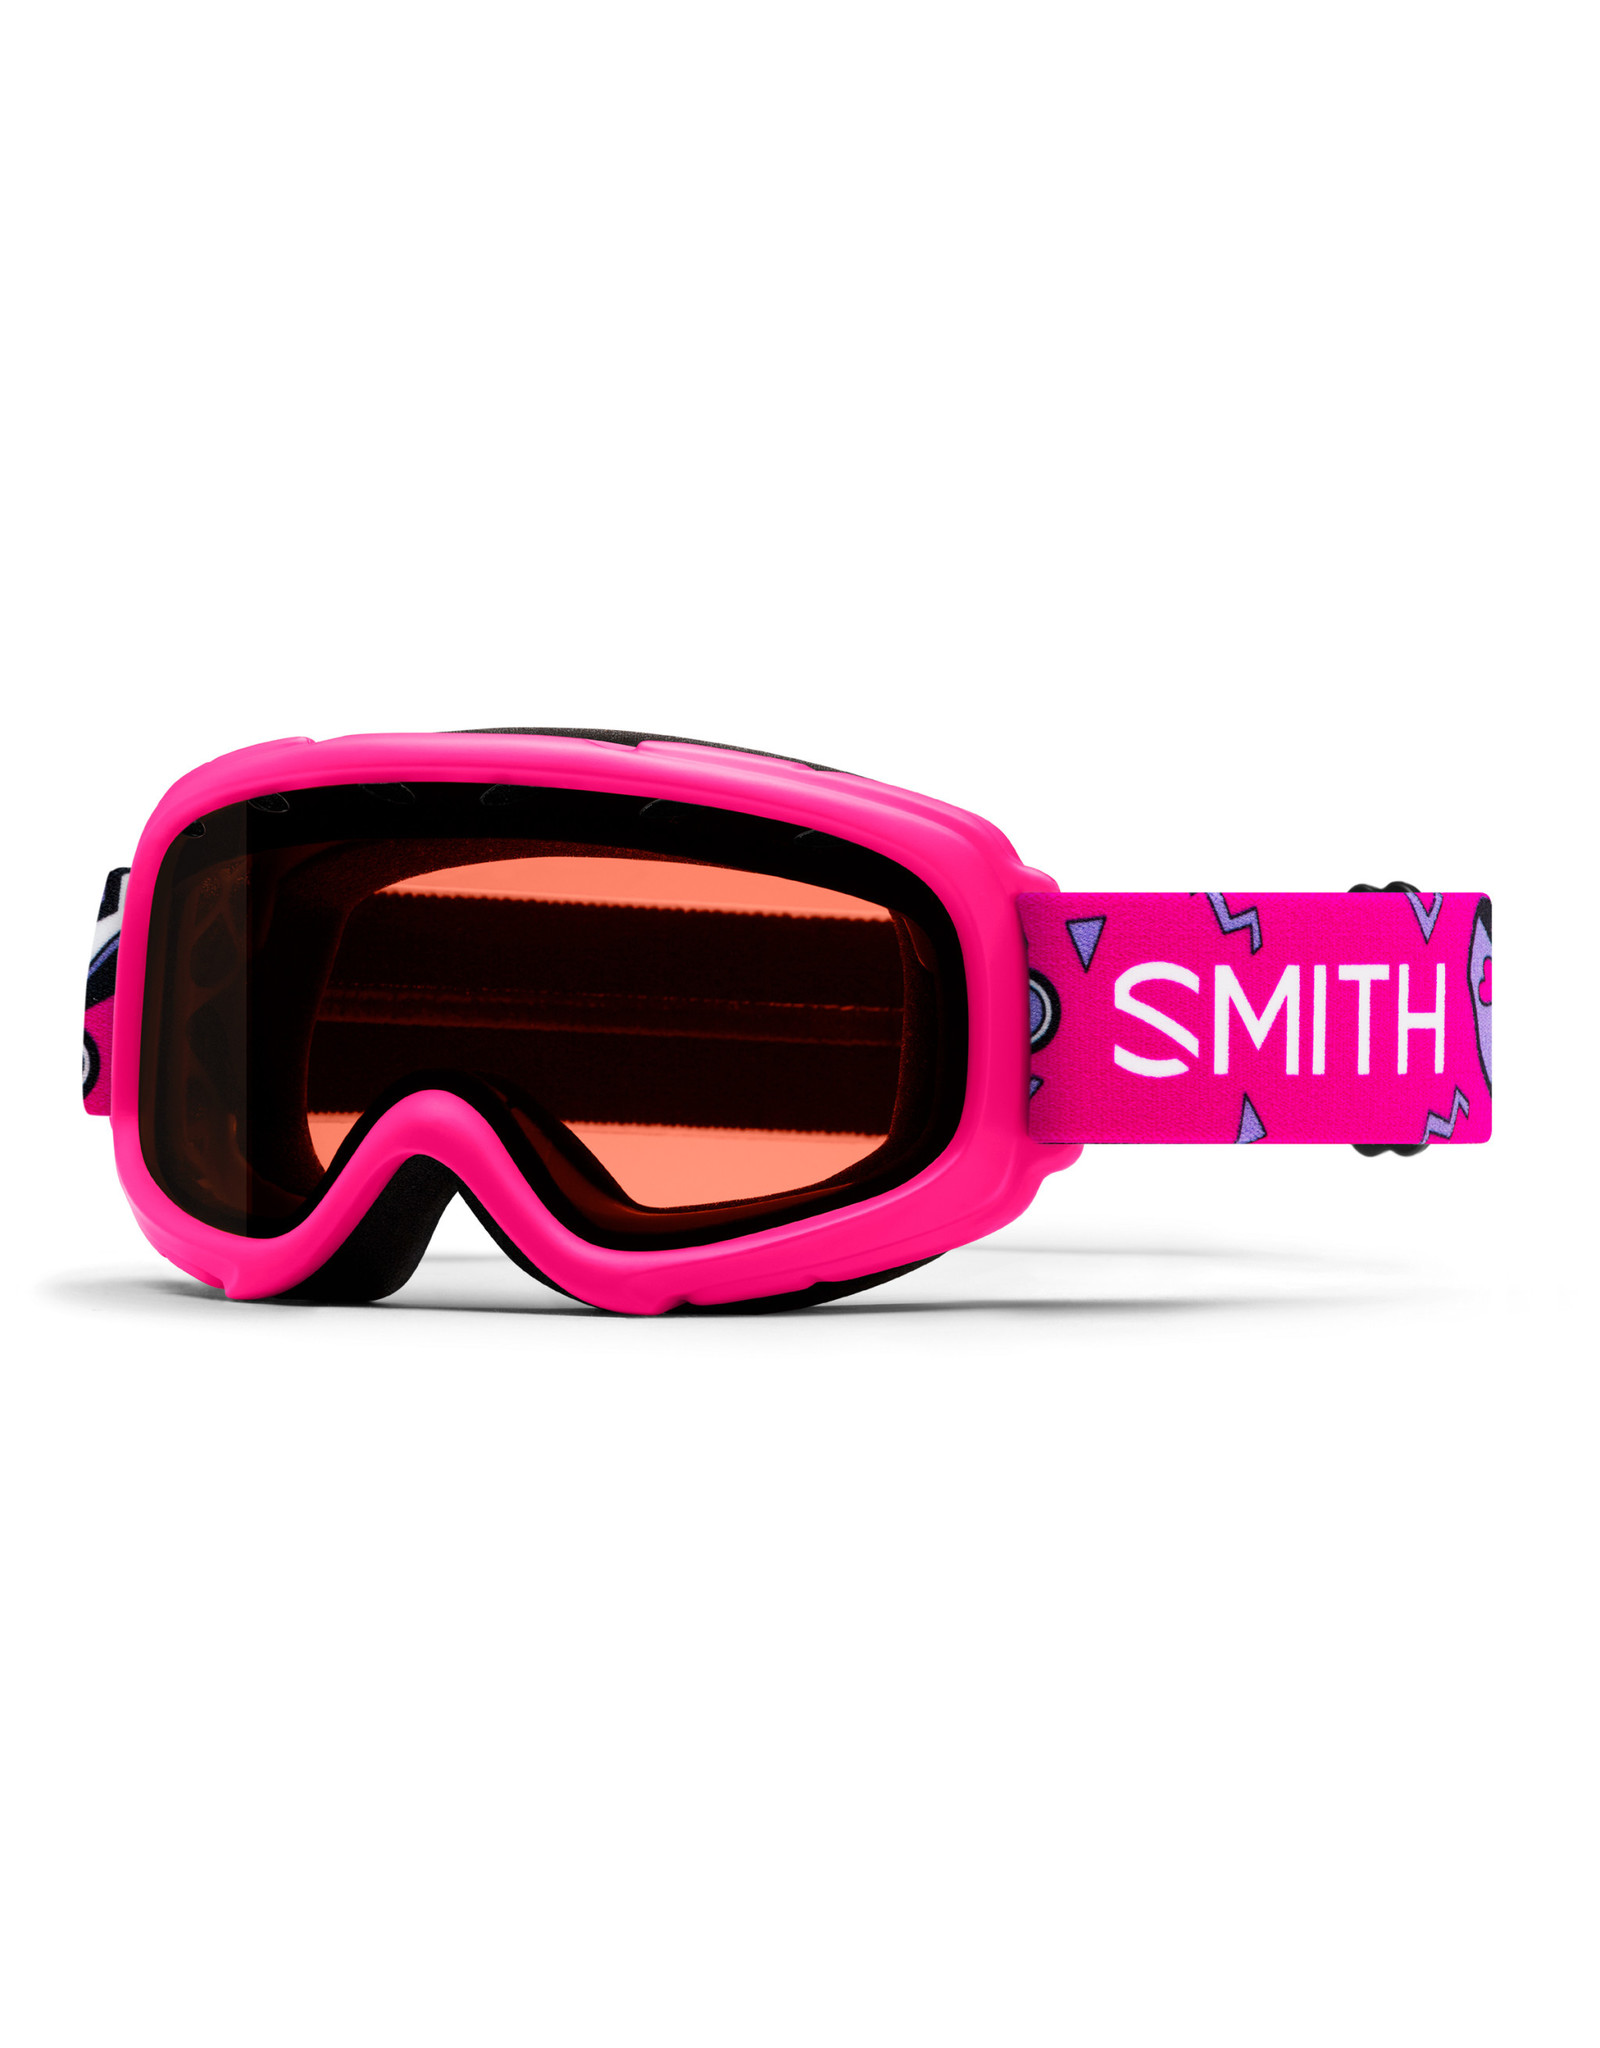 SMITH GAMBLER LUNETTE DE SKI ROSE JR 21